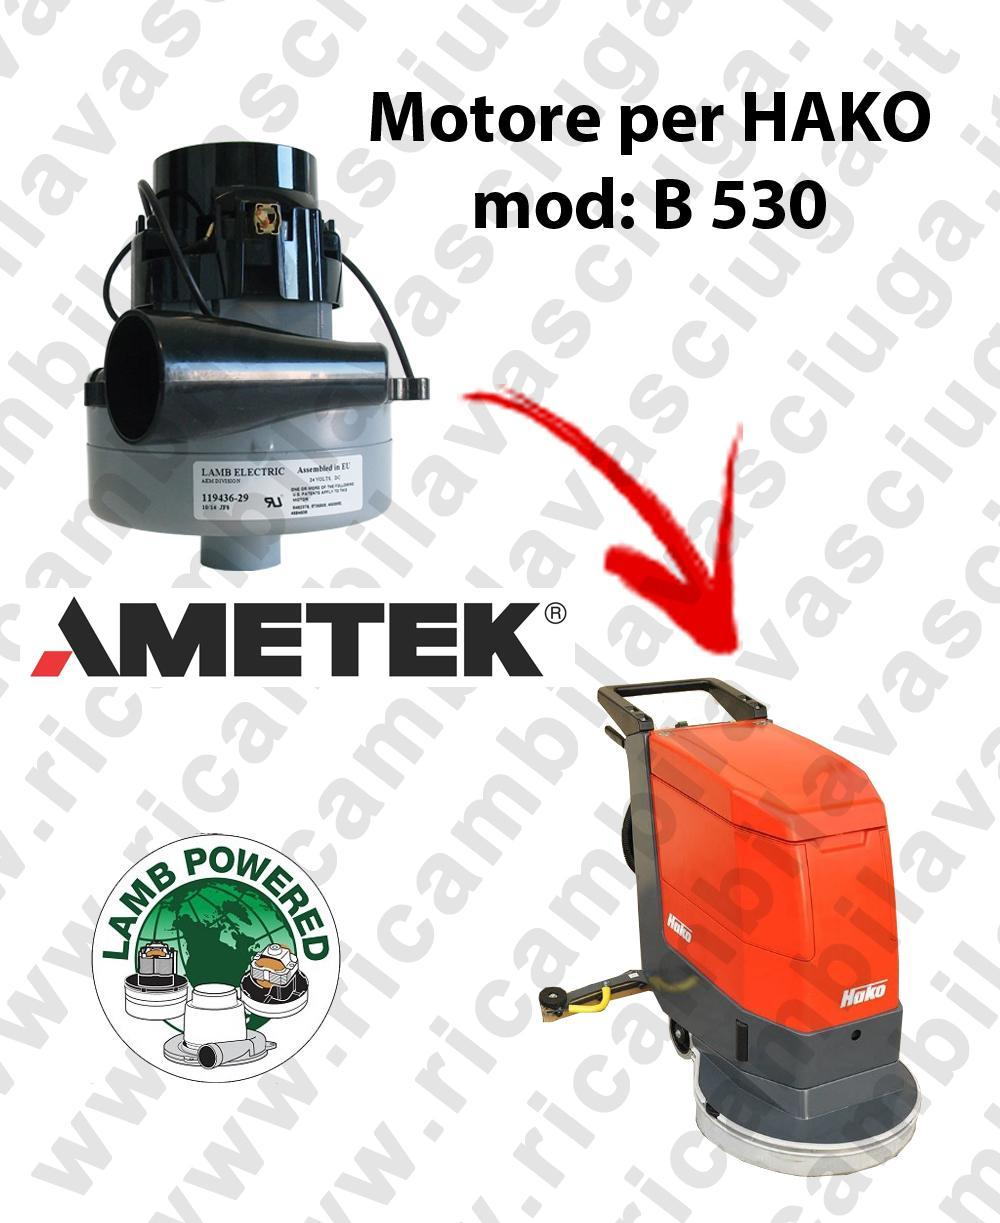 B 530 Motore de aspiración LAMB AMETEK para fregadora HAKO